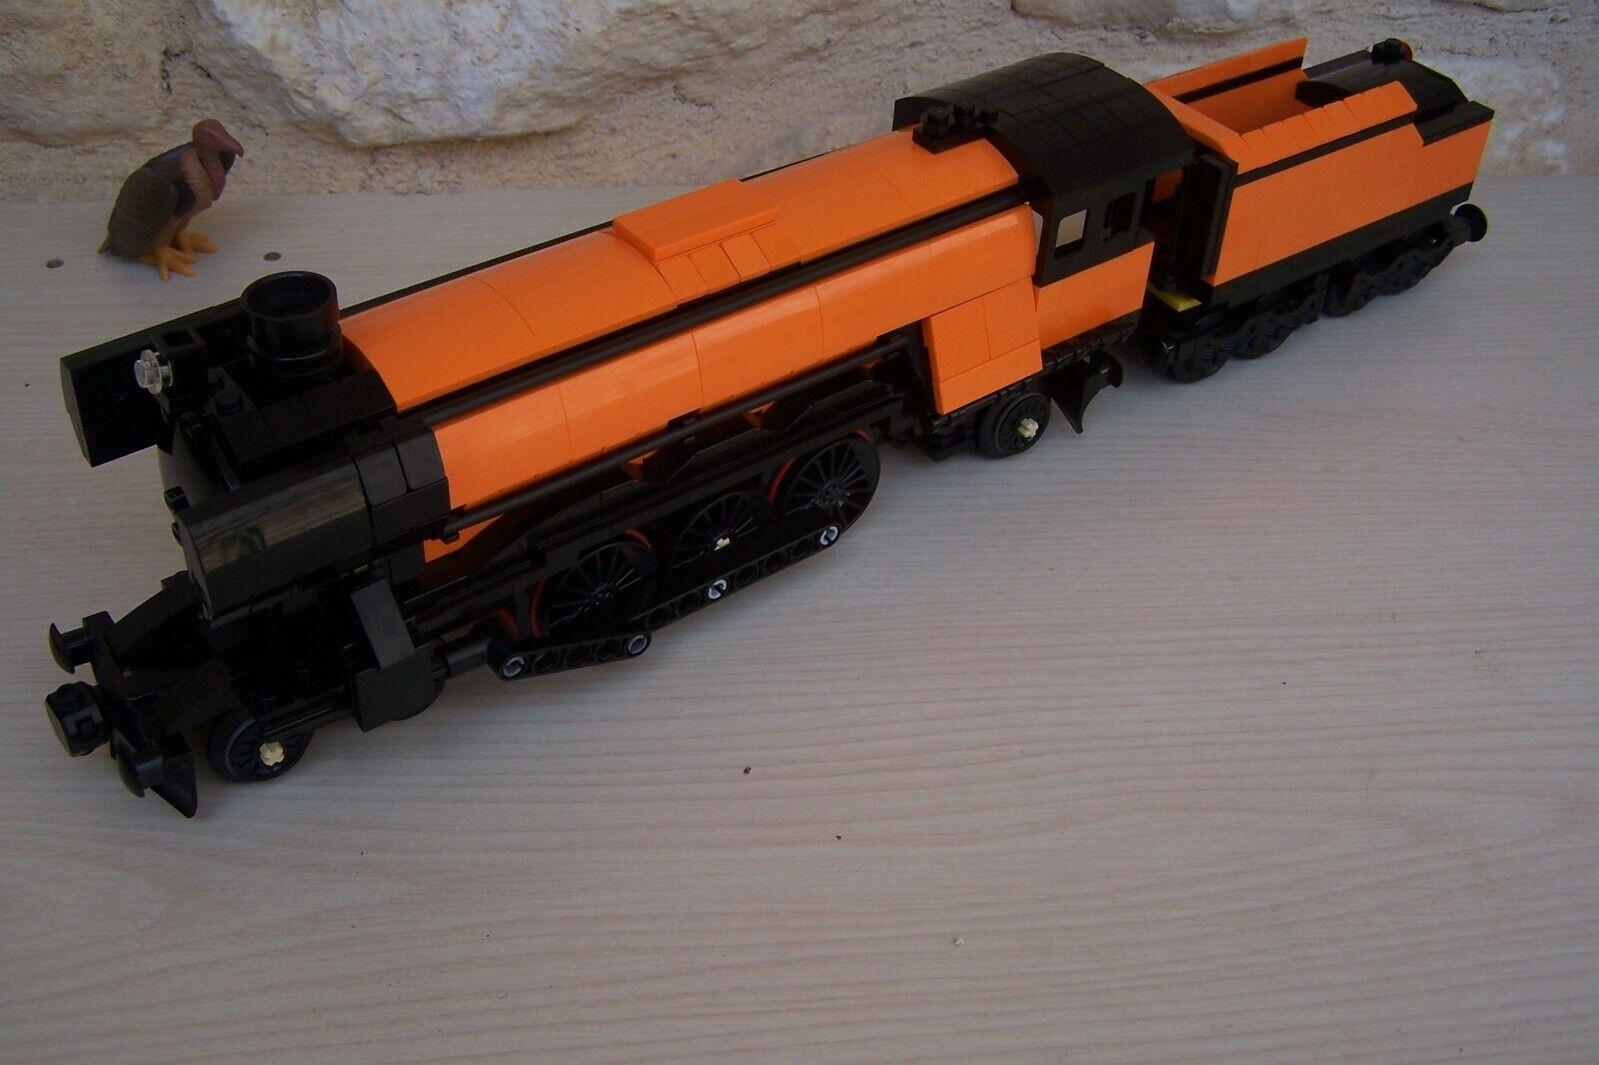 Lego train emerald night 10194 with tender , modified .... Orange and schwarz ....